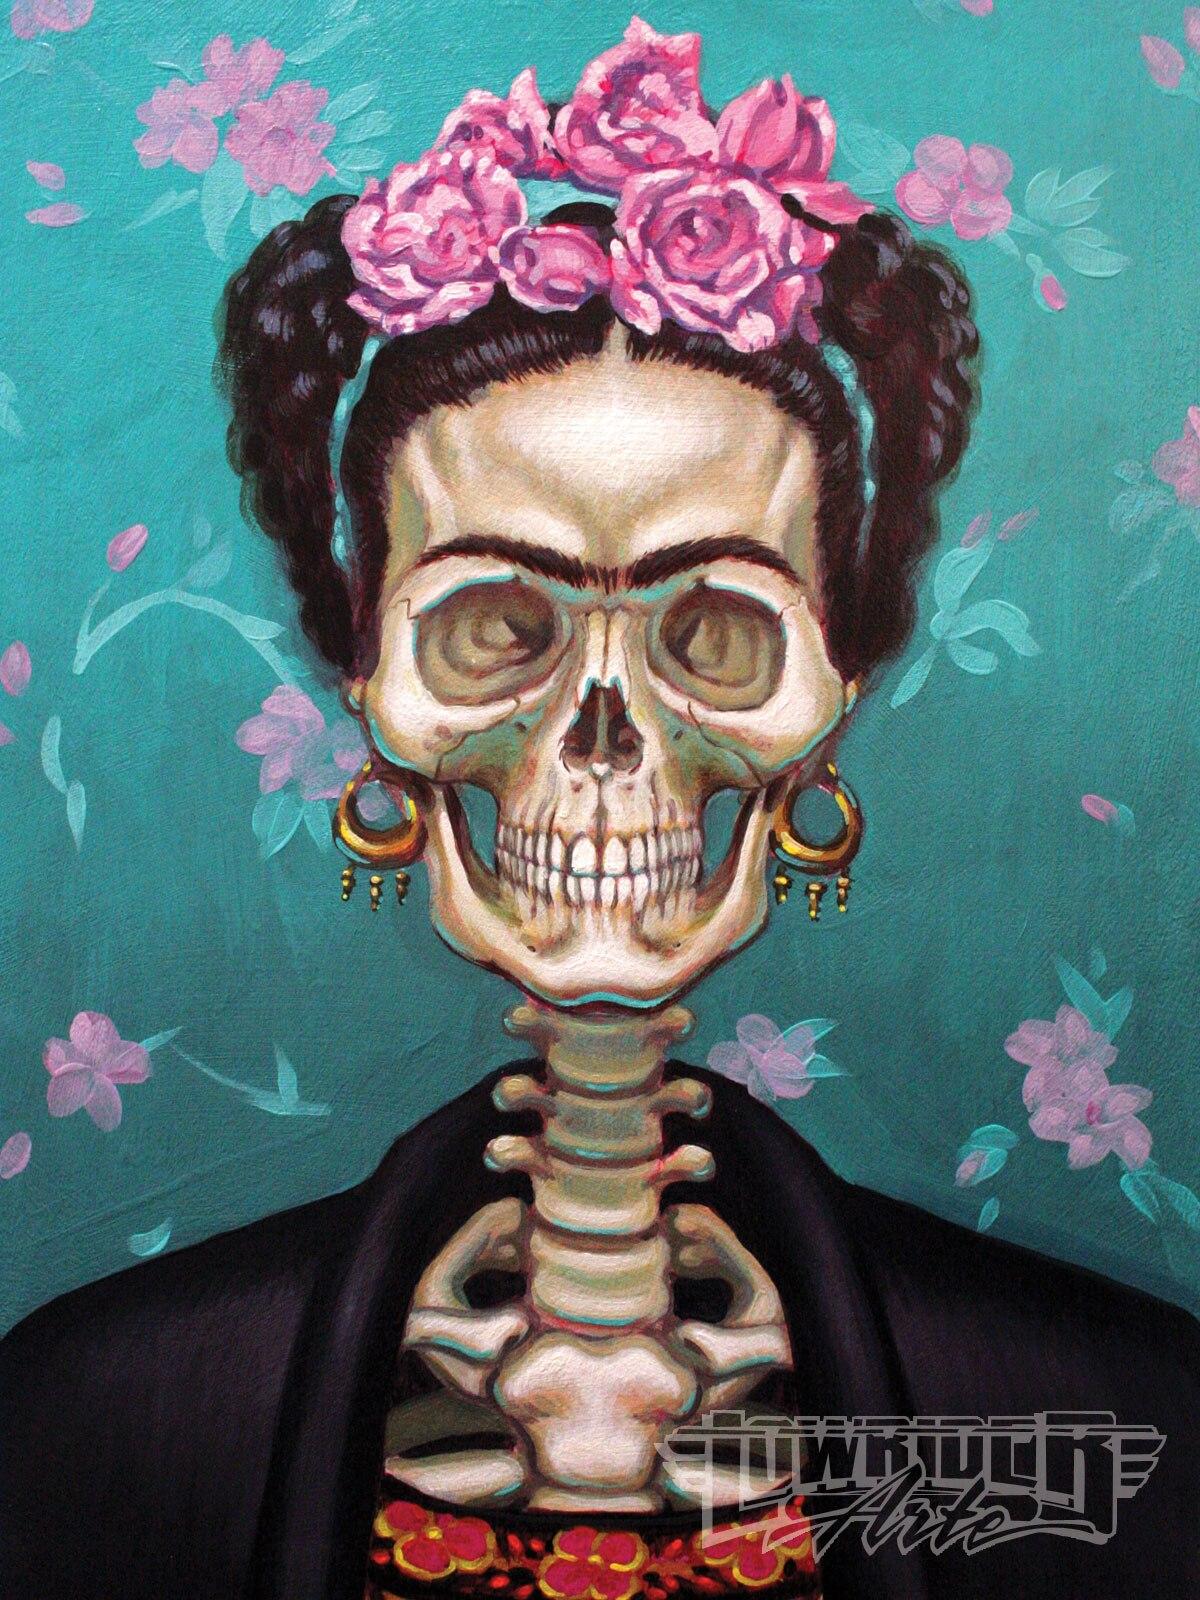 Francisco Franco Featured Artist Lowrider Arte Magazine